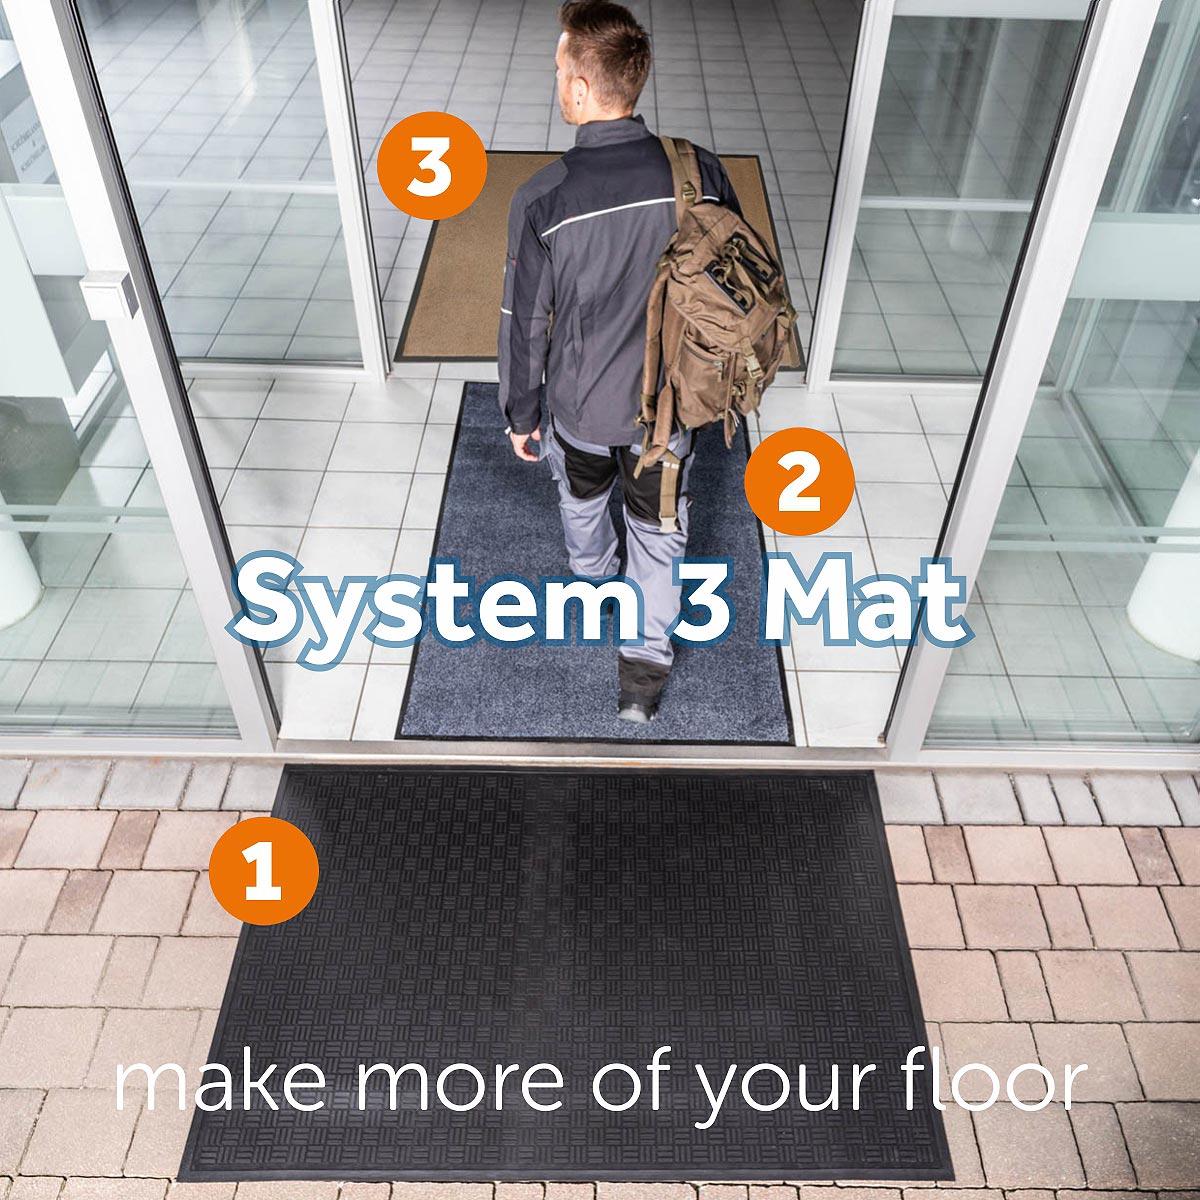 system 3 mat